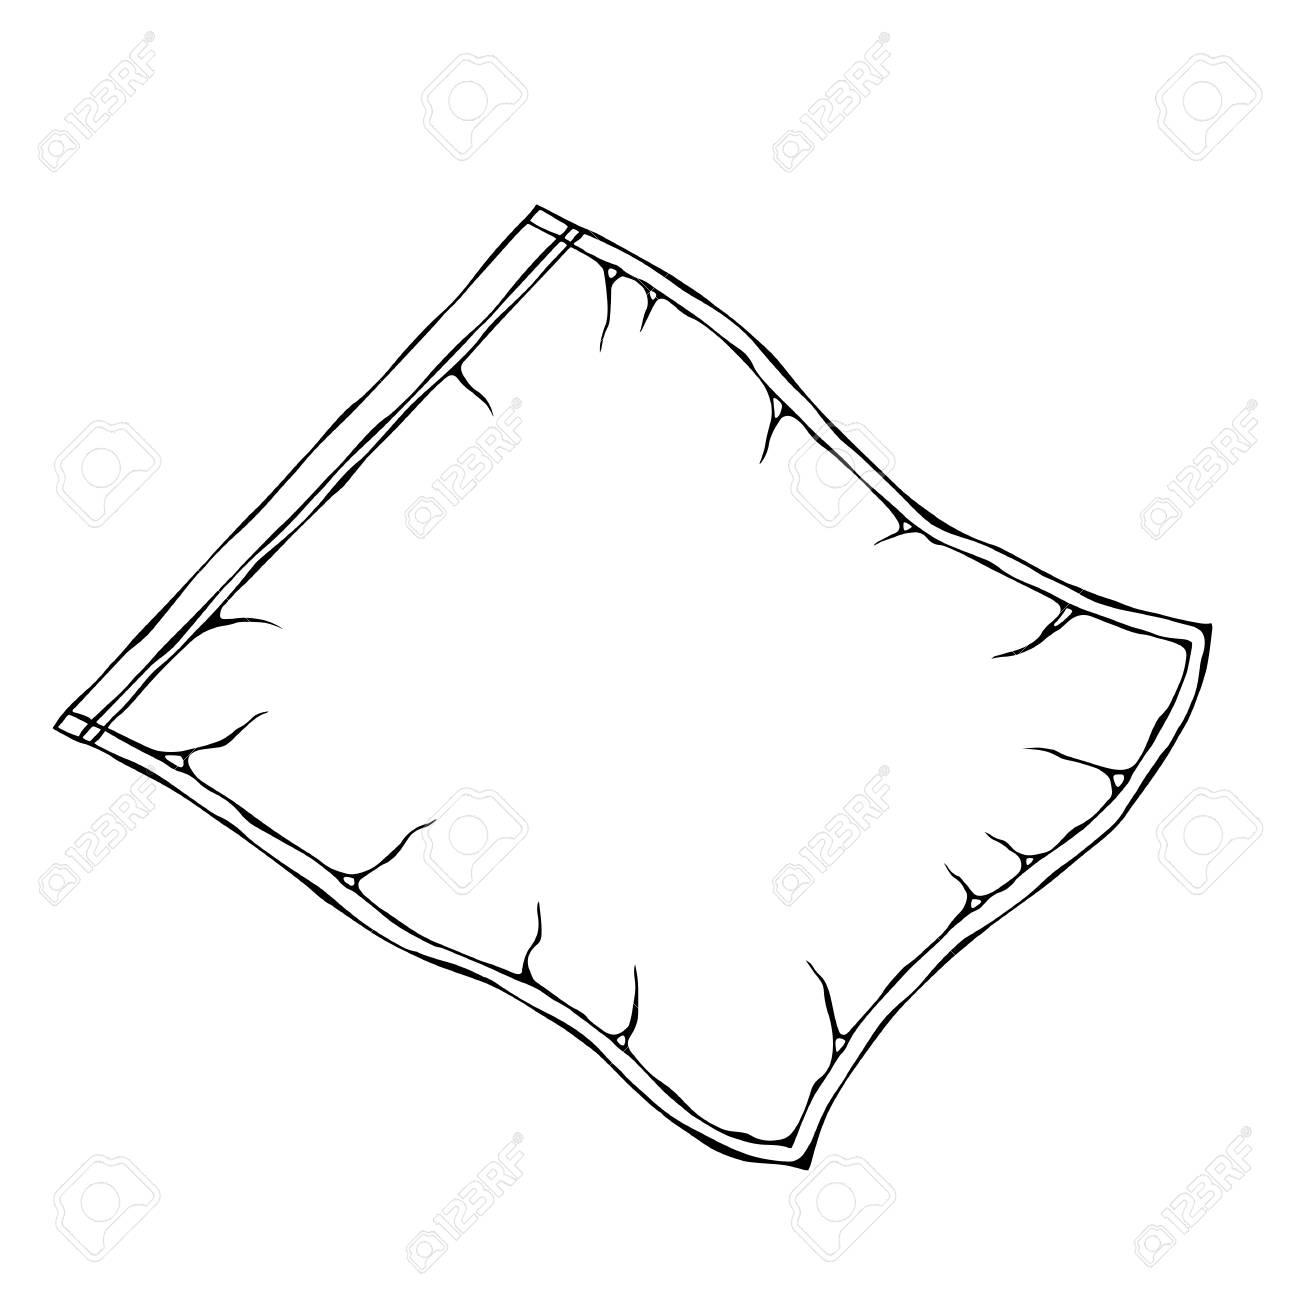 Vacuum Plastic Bag. EPS10 Vector. Hand Drawn Doodle Style Realistic Illustration - 126910589